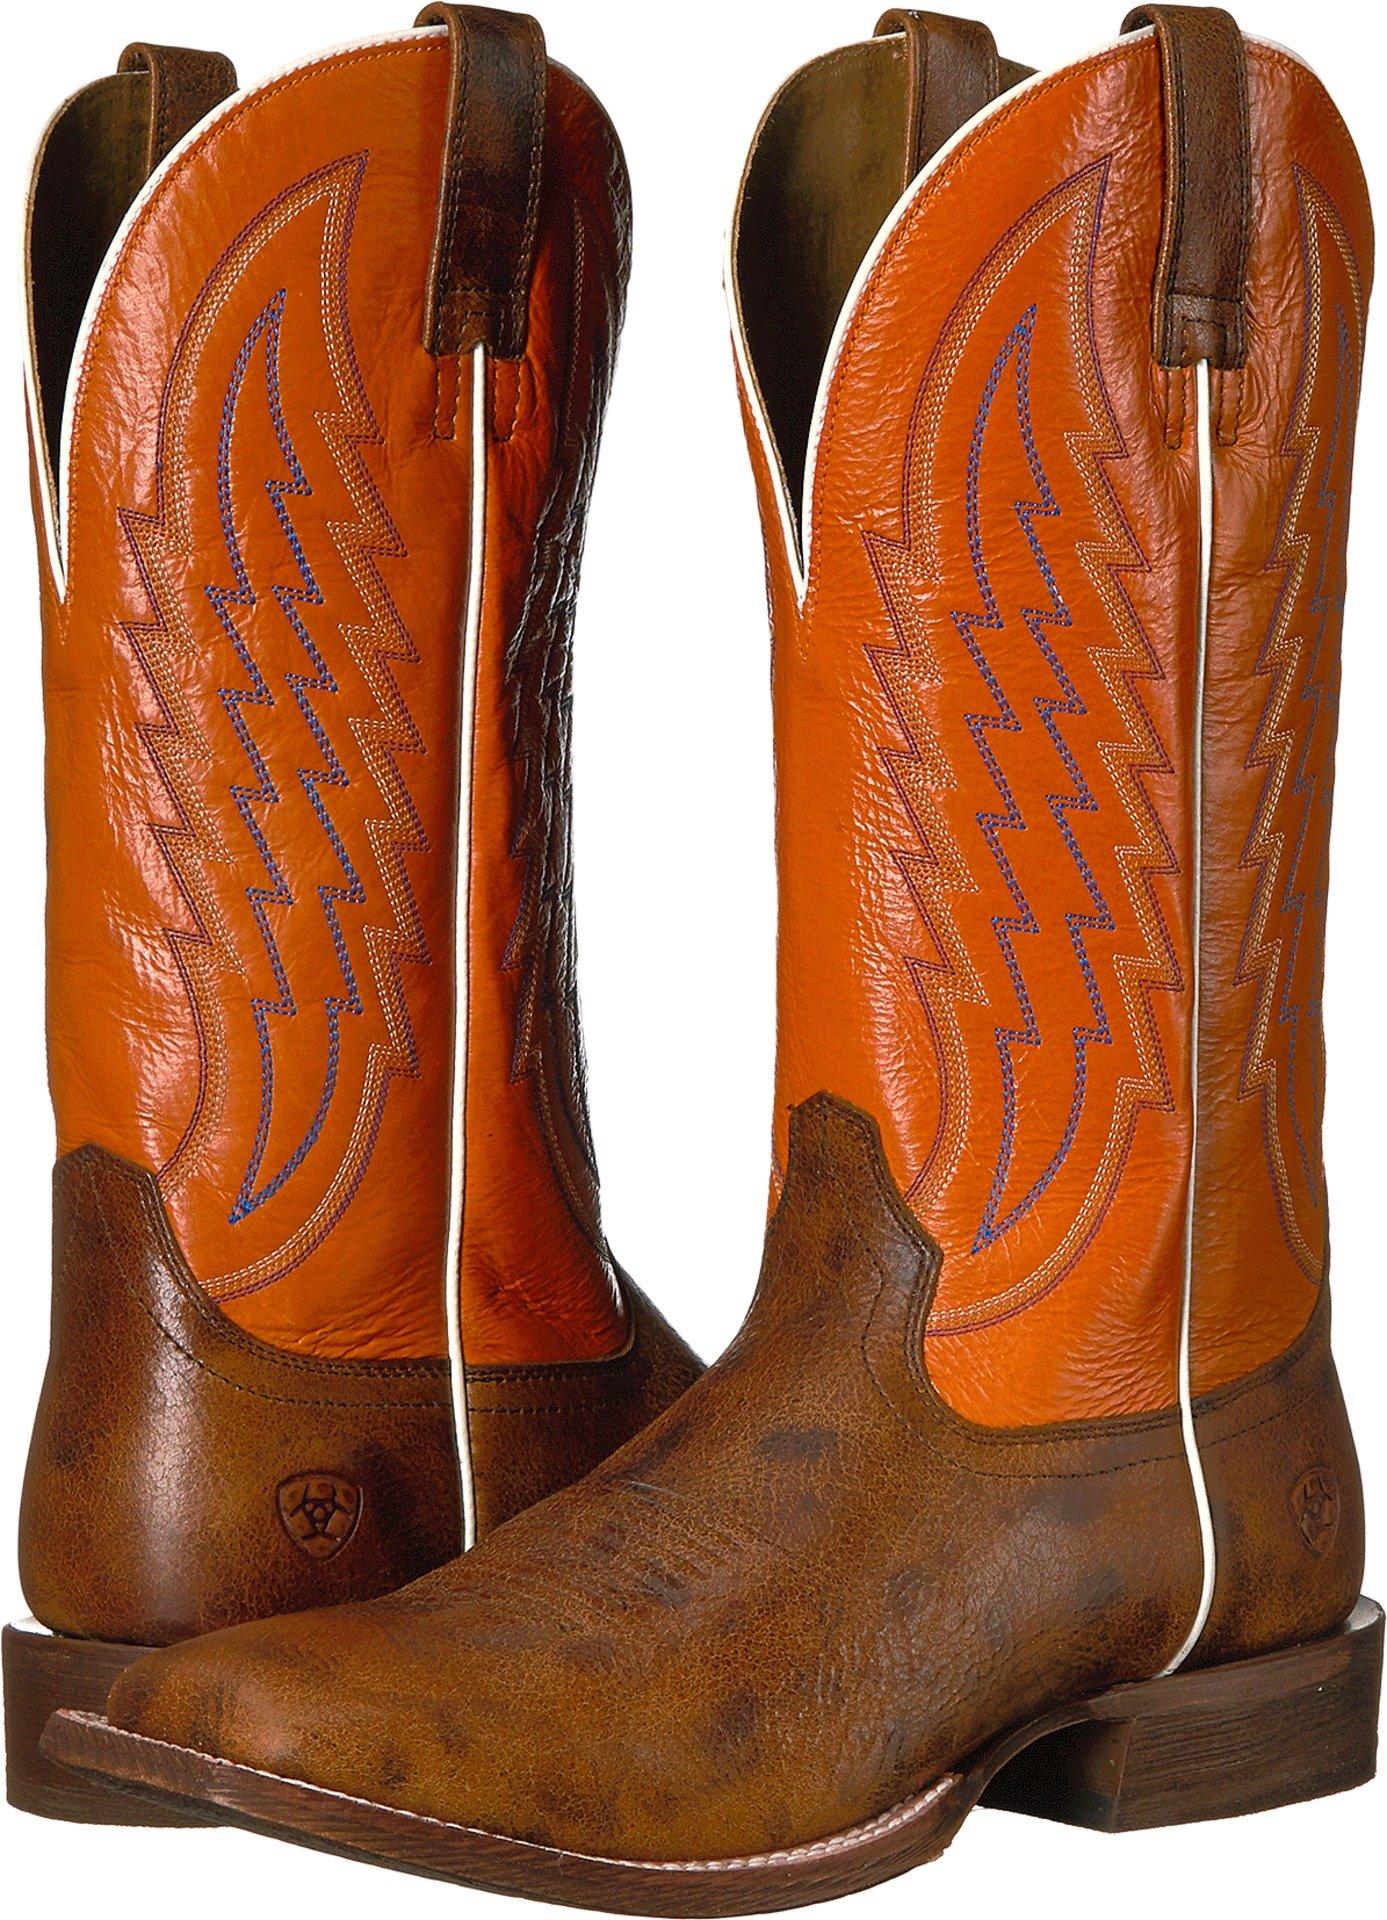 Ariat Men's Circuit Stride Western Boot Square Toe Brown 11.5 D